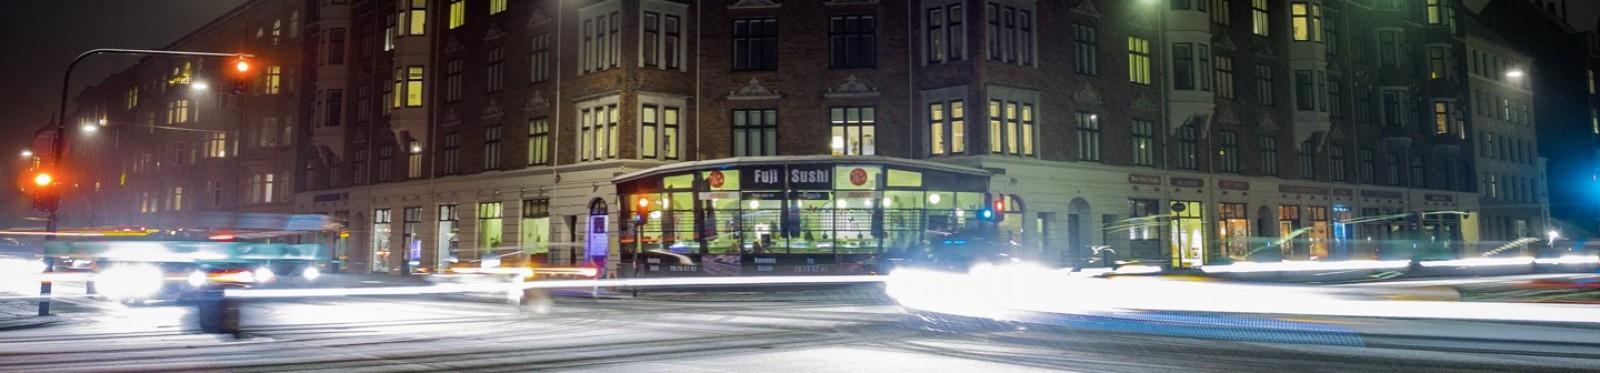 ABF Slotskroen